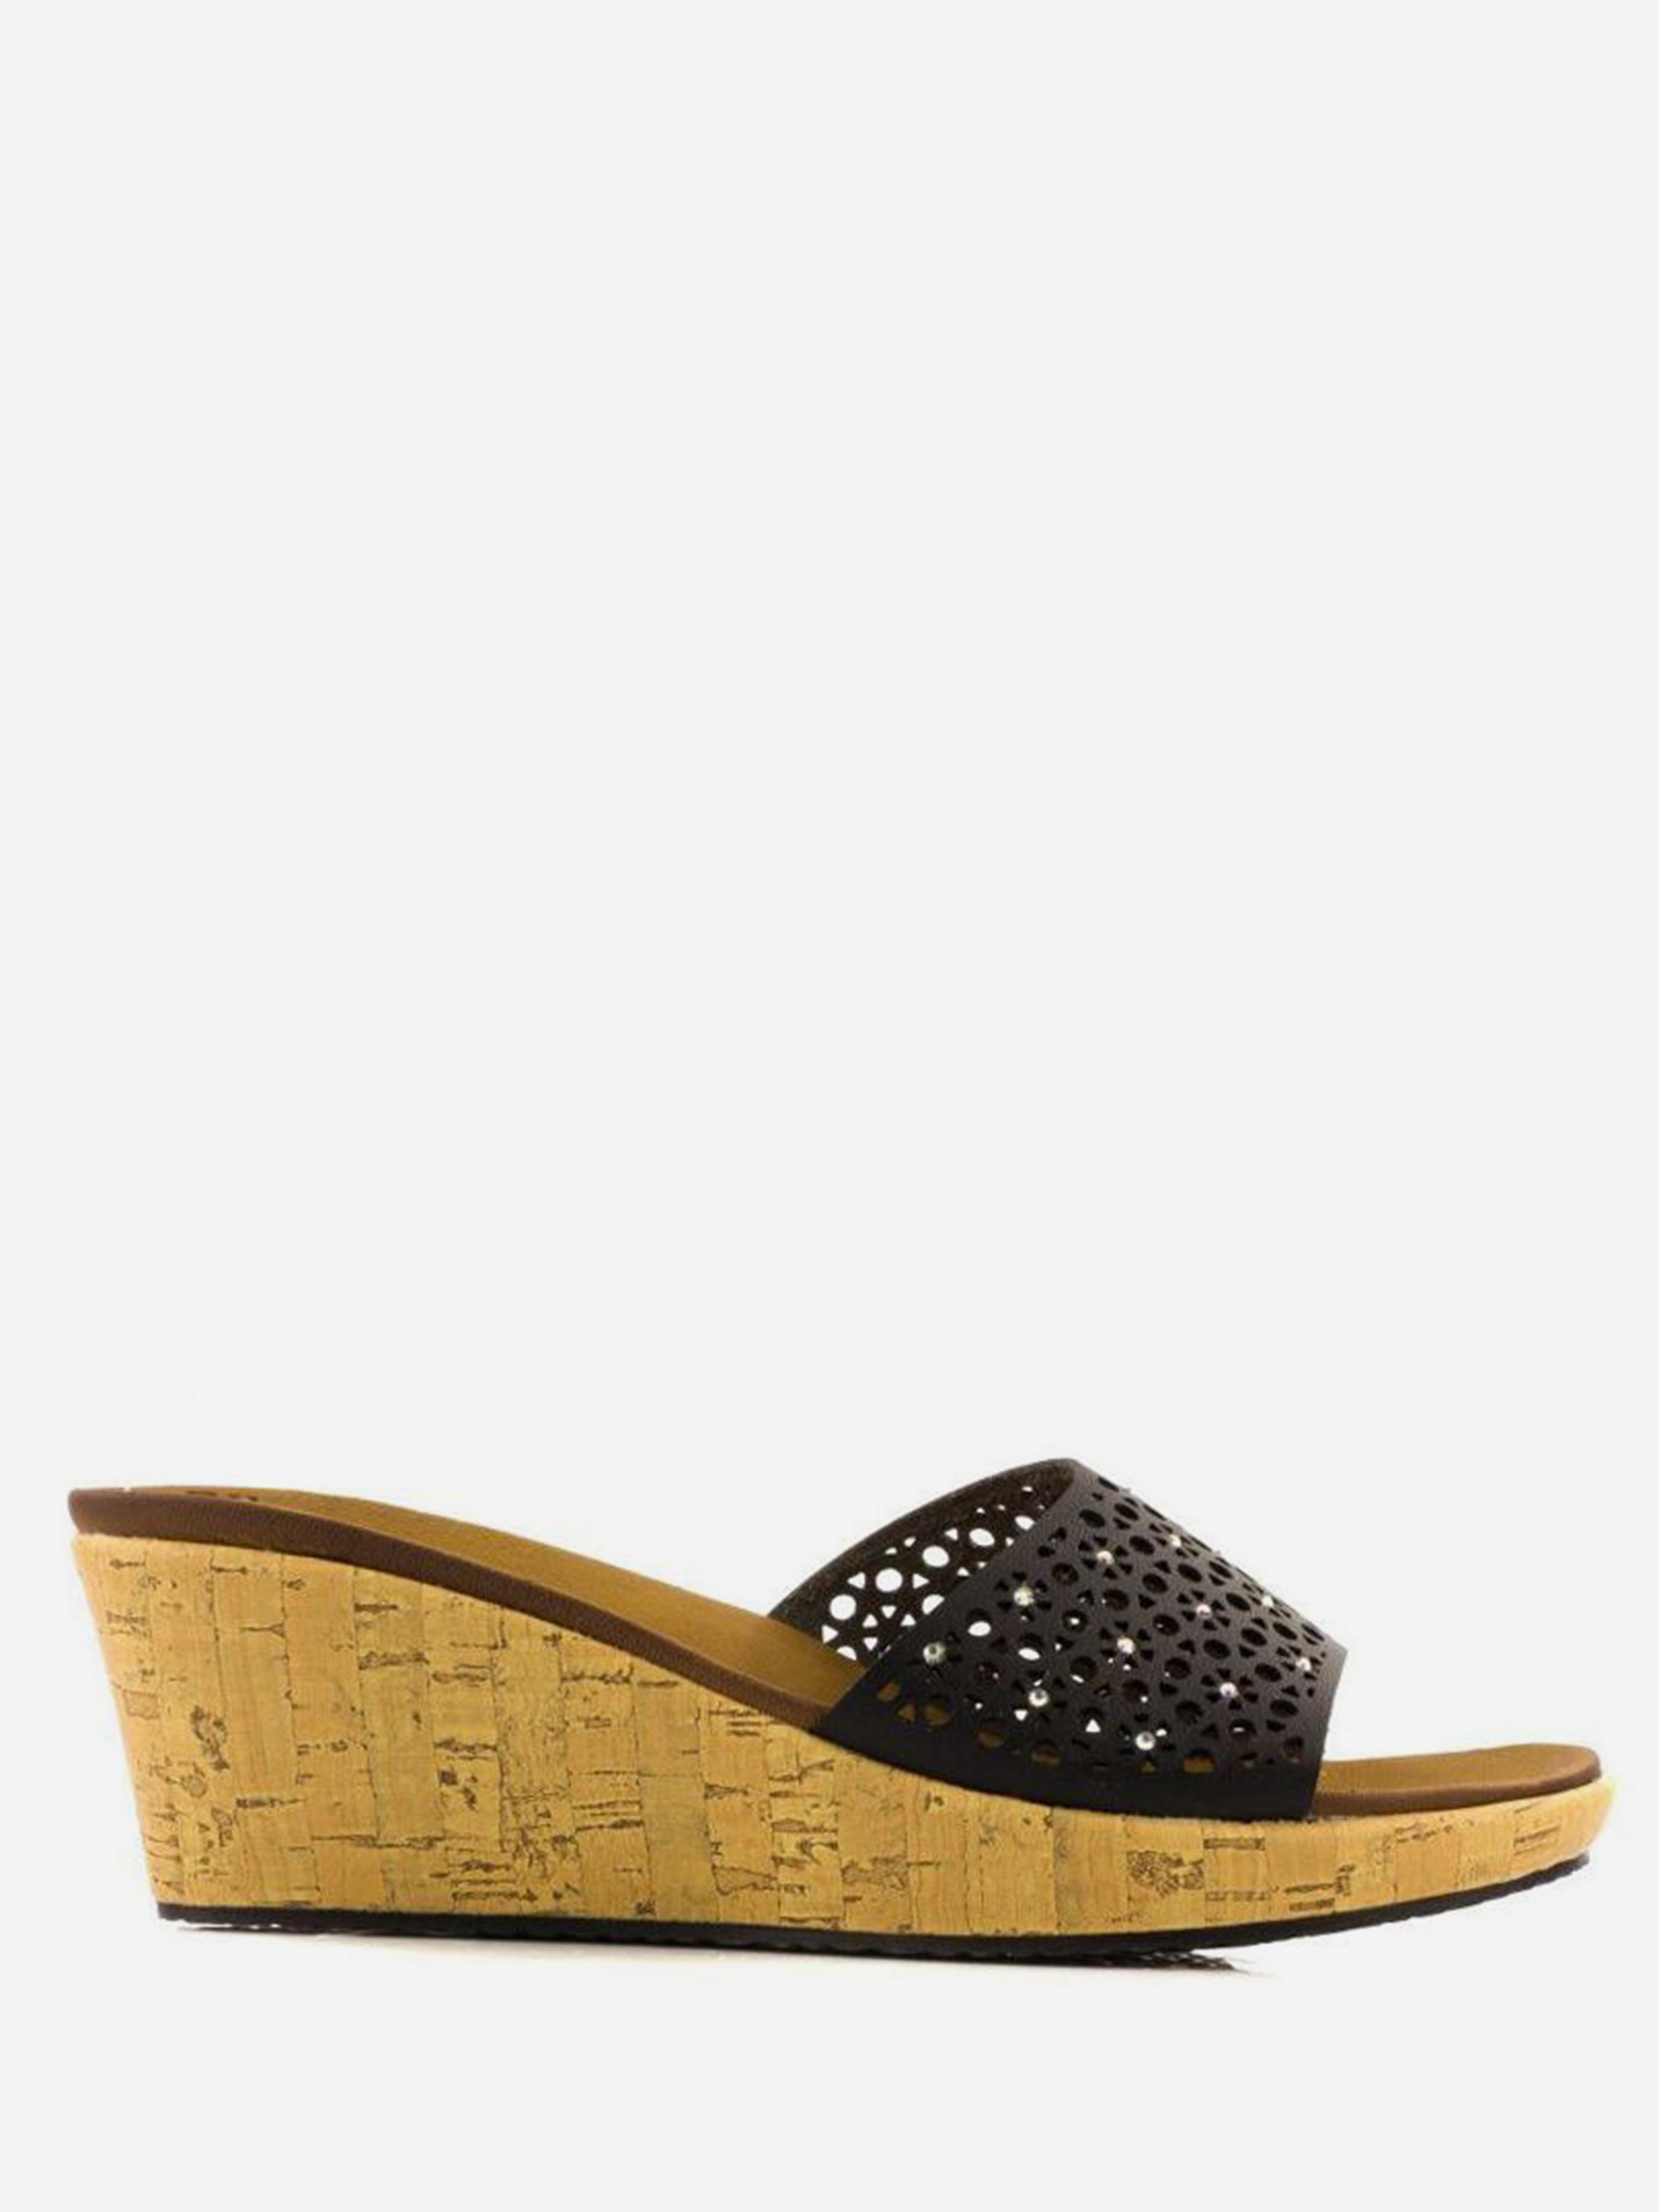 Шлёпанцы для женщин Skechers 38555 BLK модная обувь, 2017